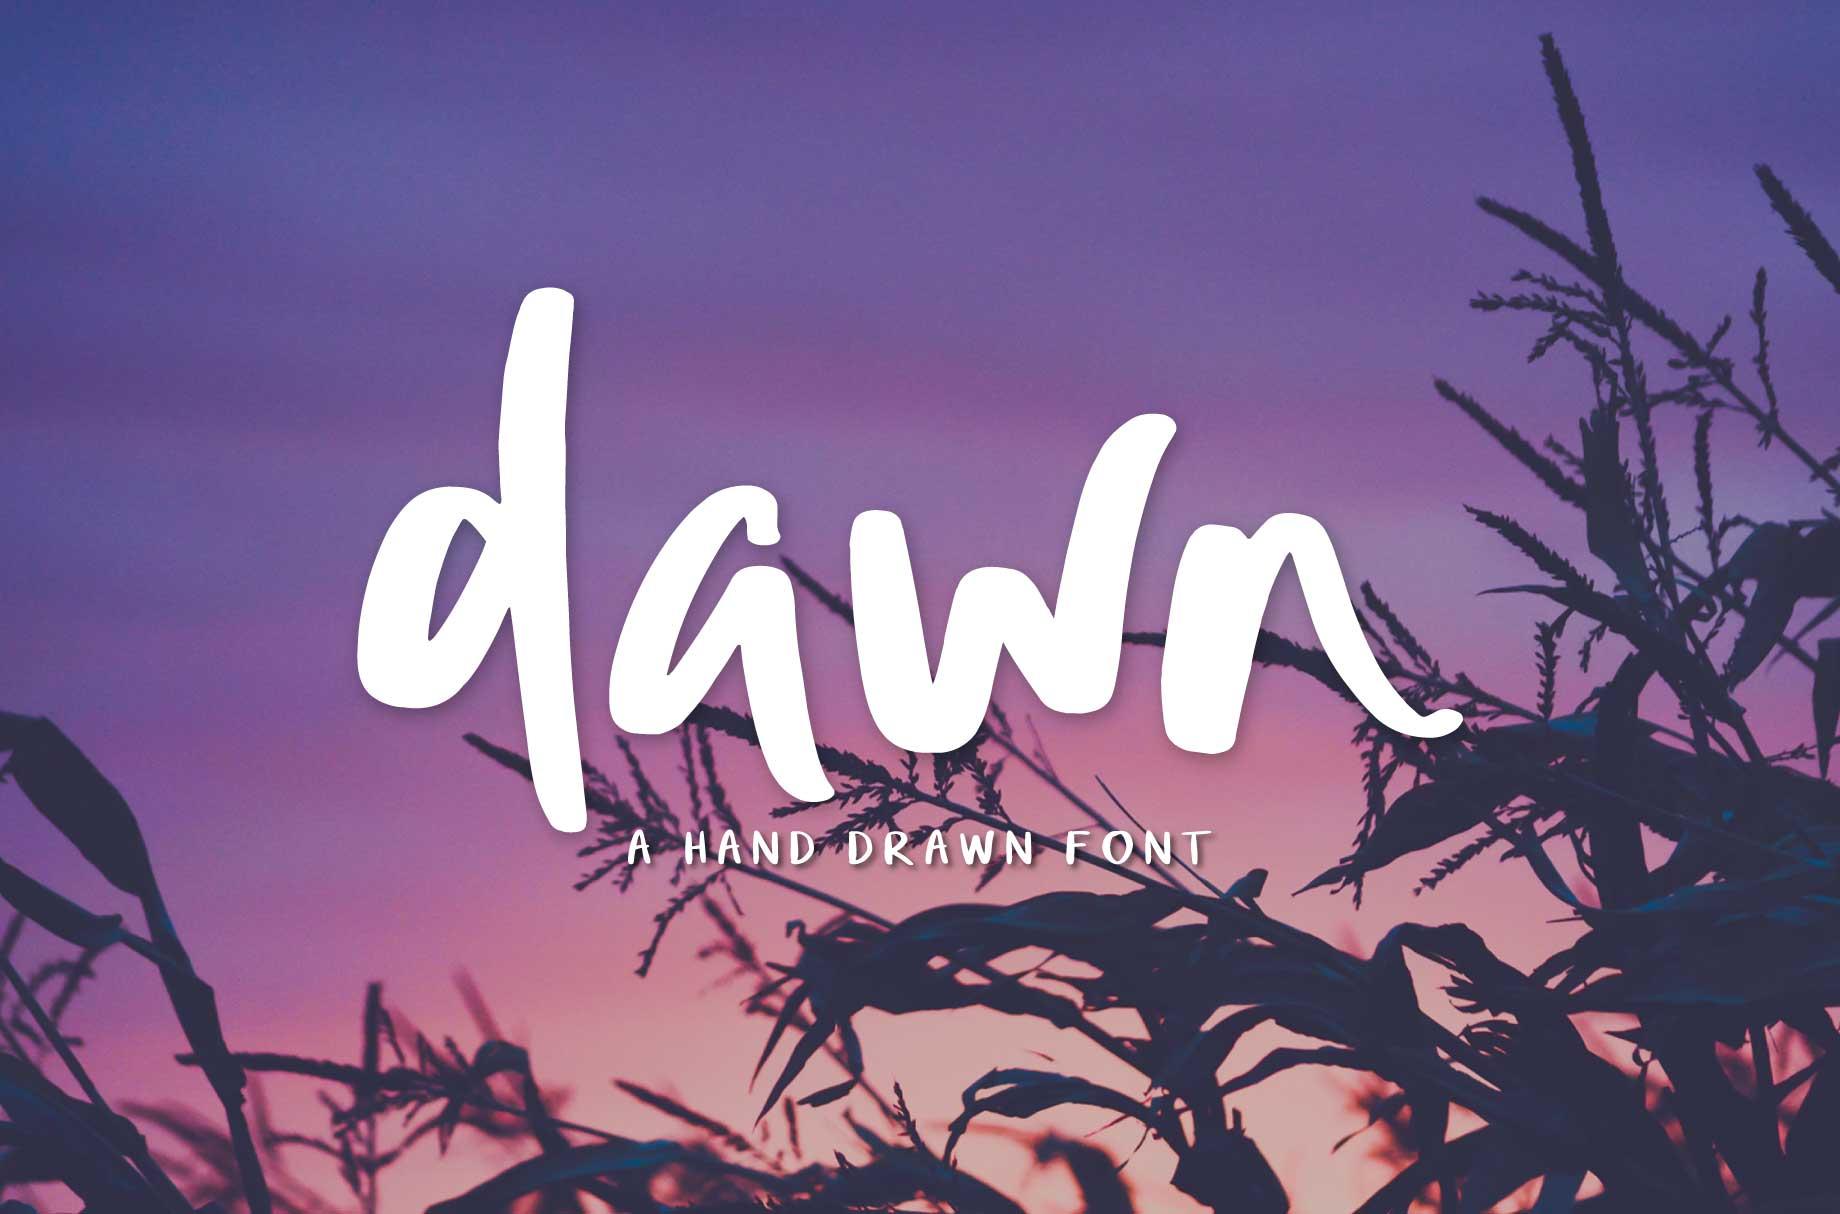 Dawn-Handwritten-Brush-Font-by-Big-Cat-Creative.jpg